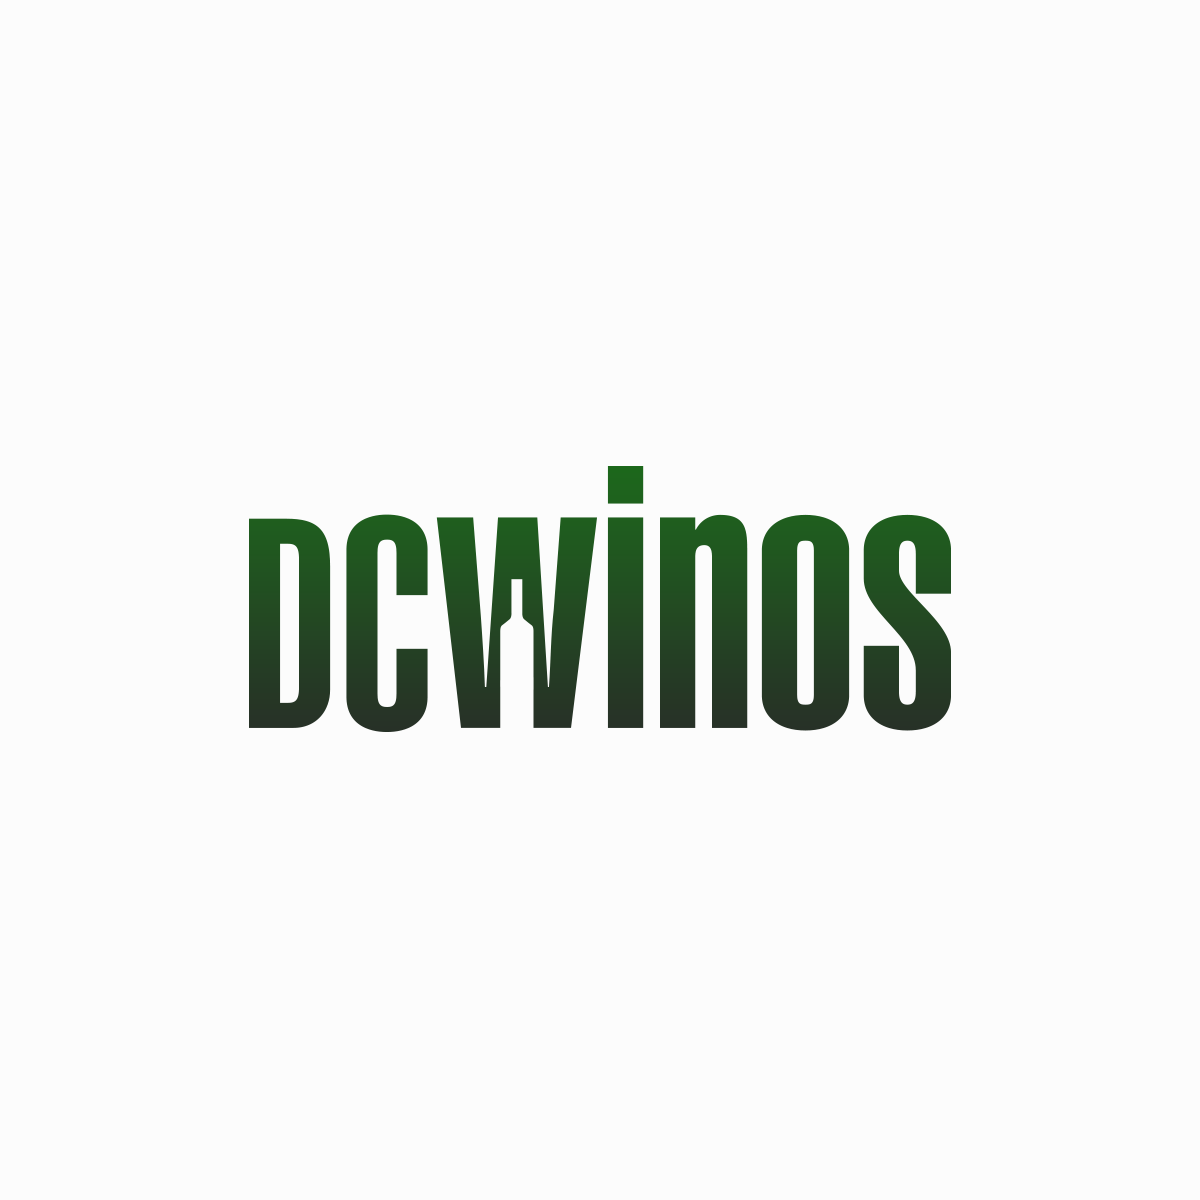 DCWINOs